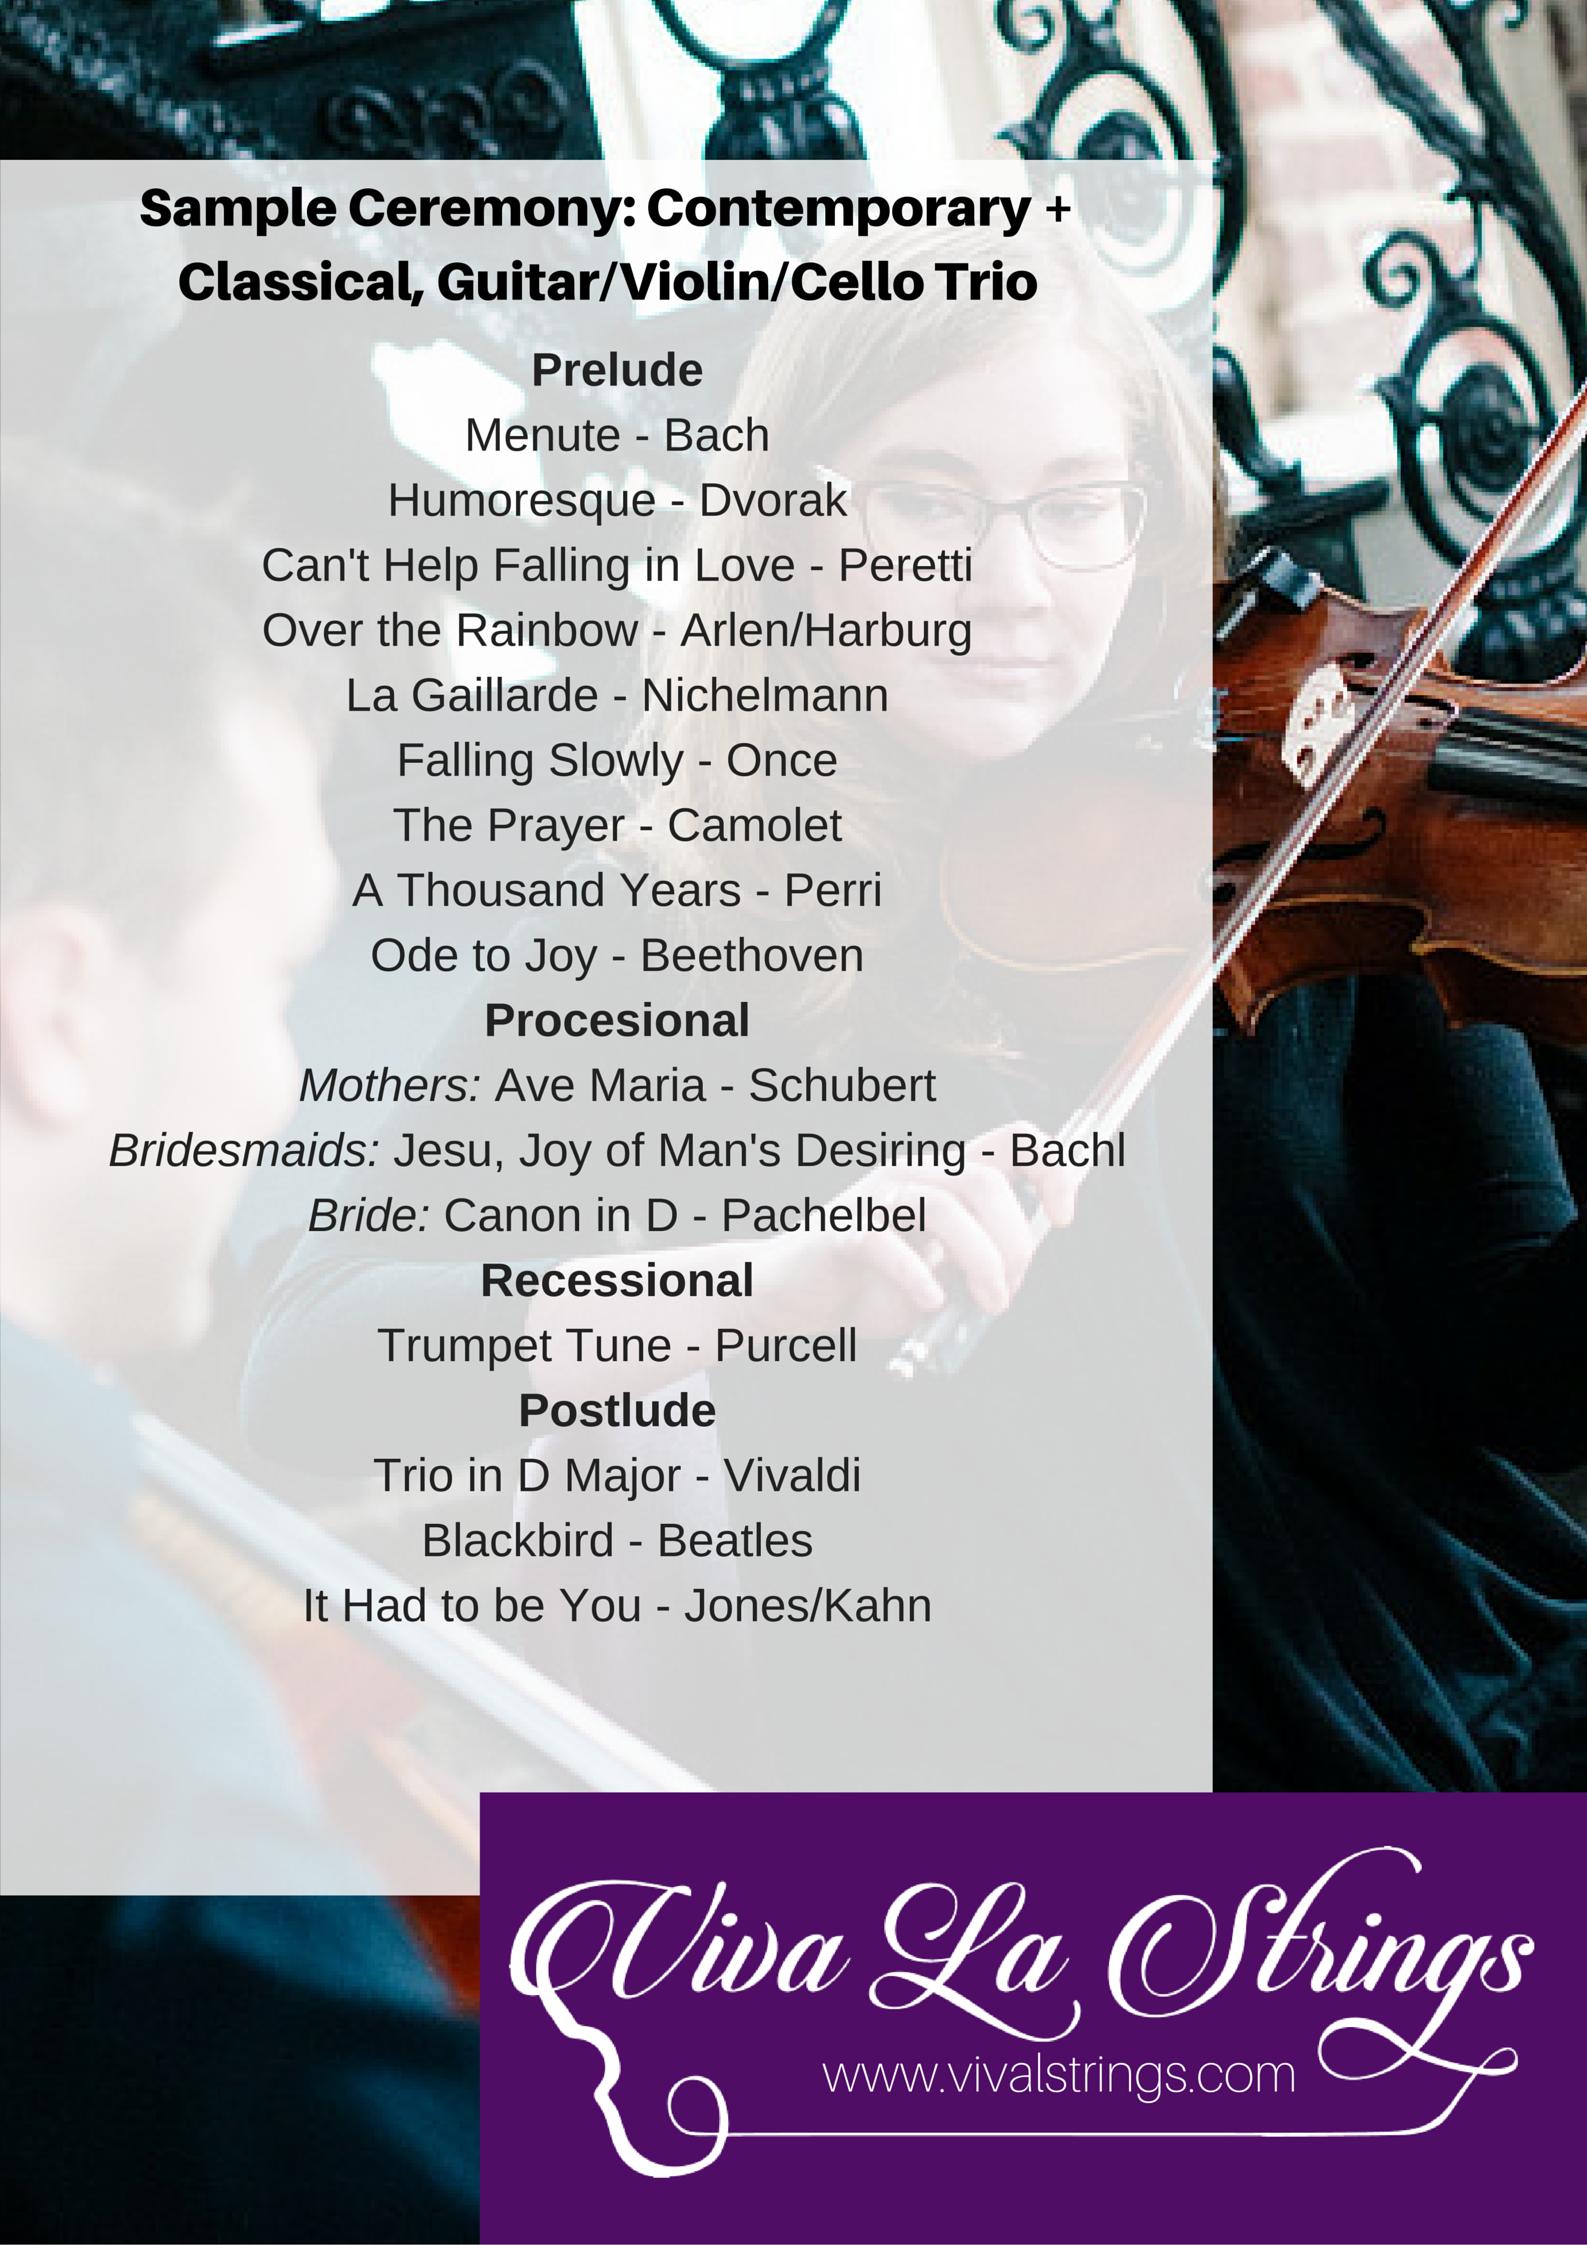 Contemporary + Classica, Guitar:Violin:Cello Trio.png